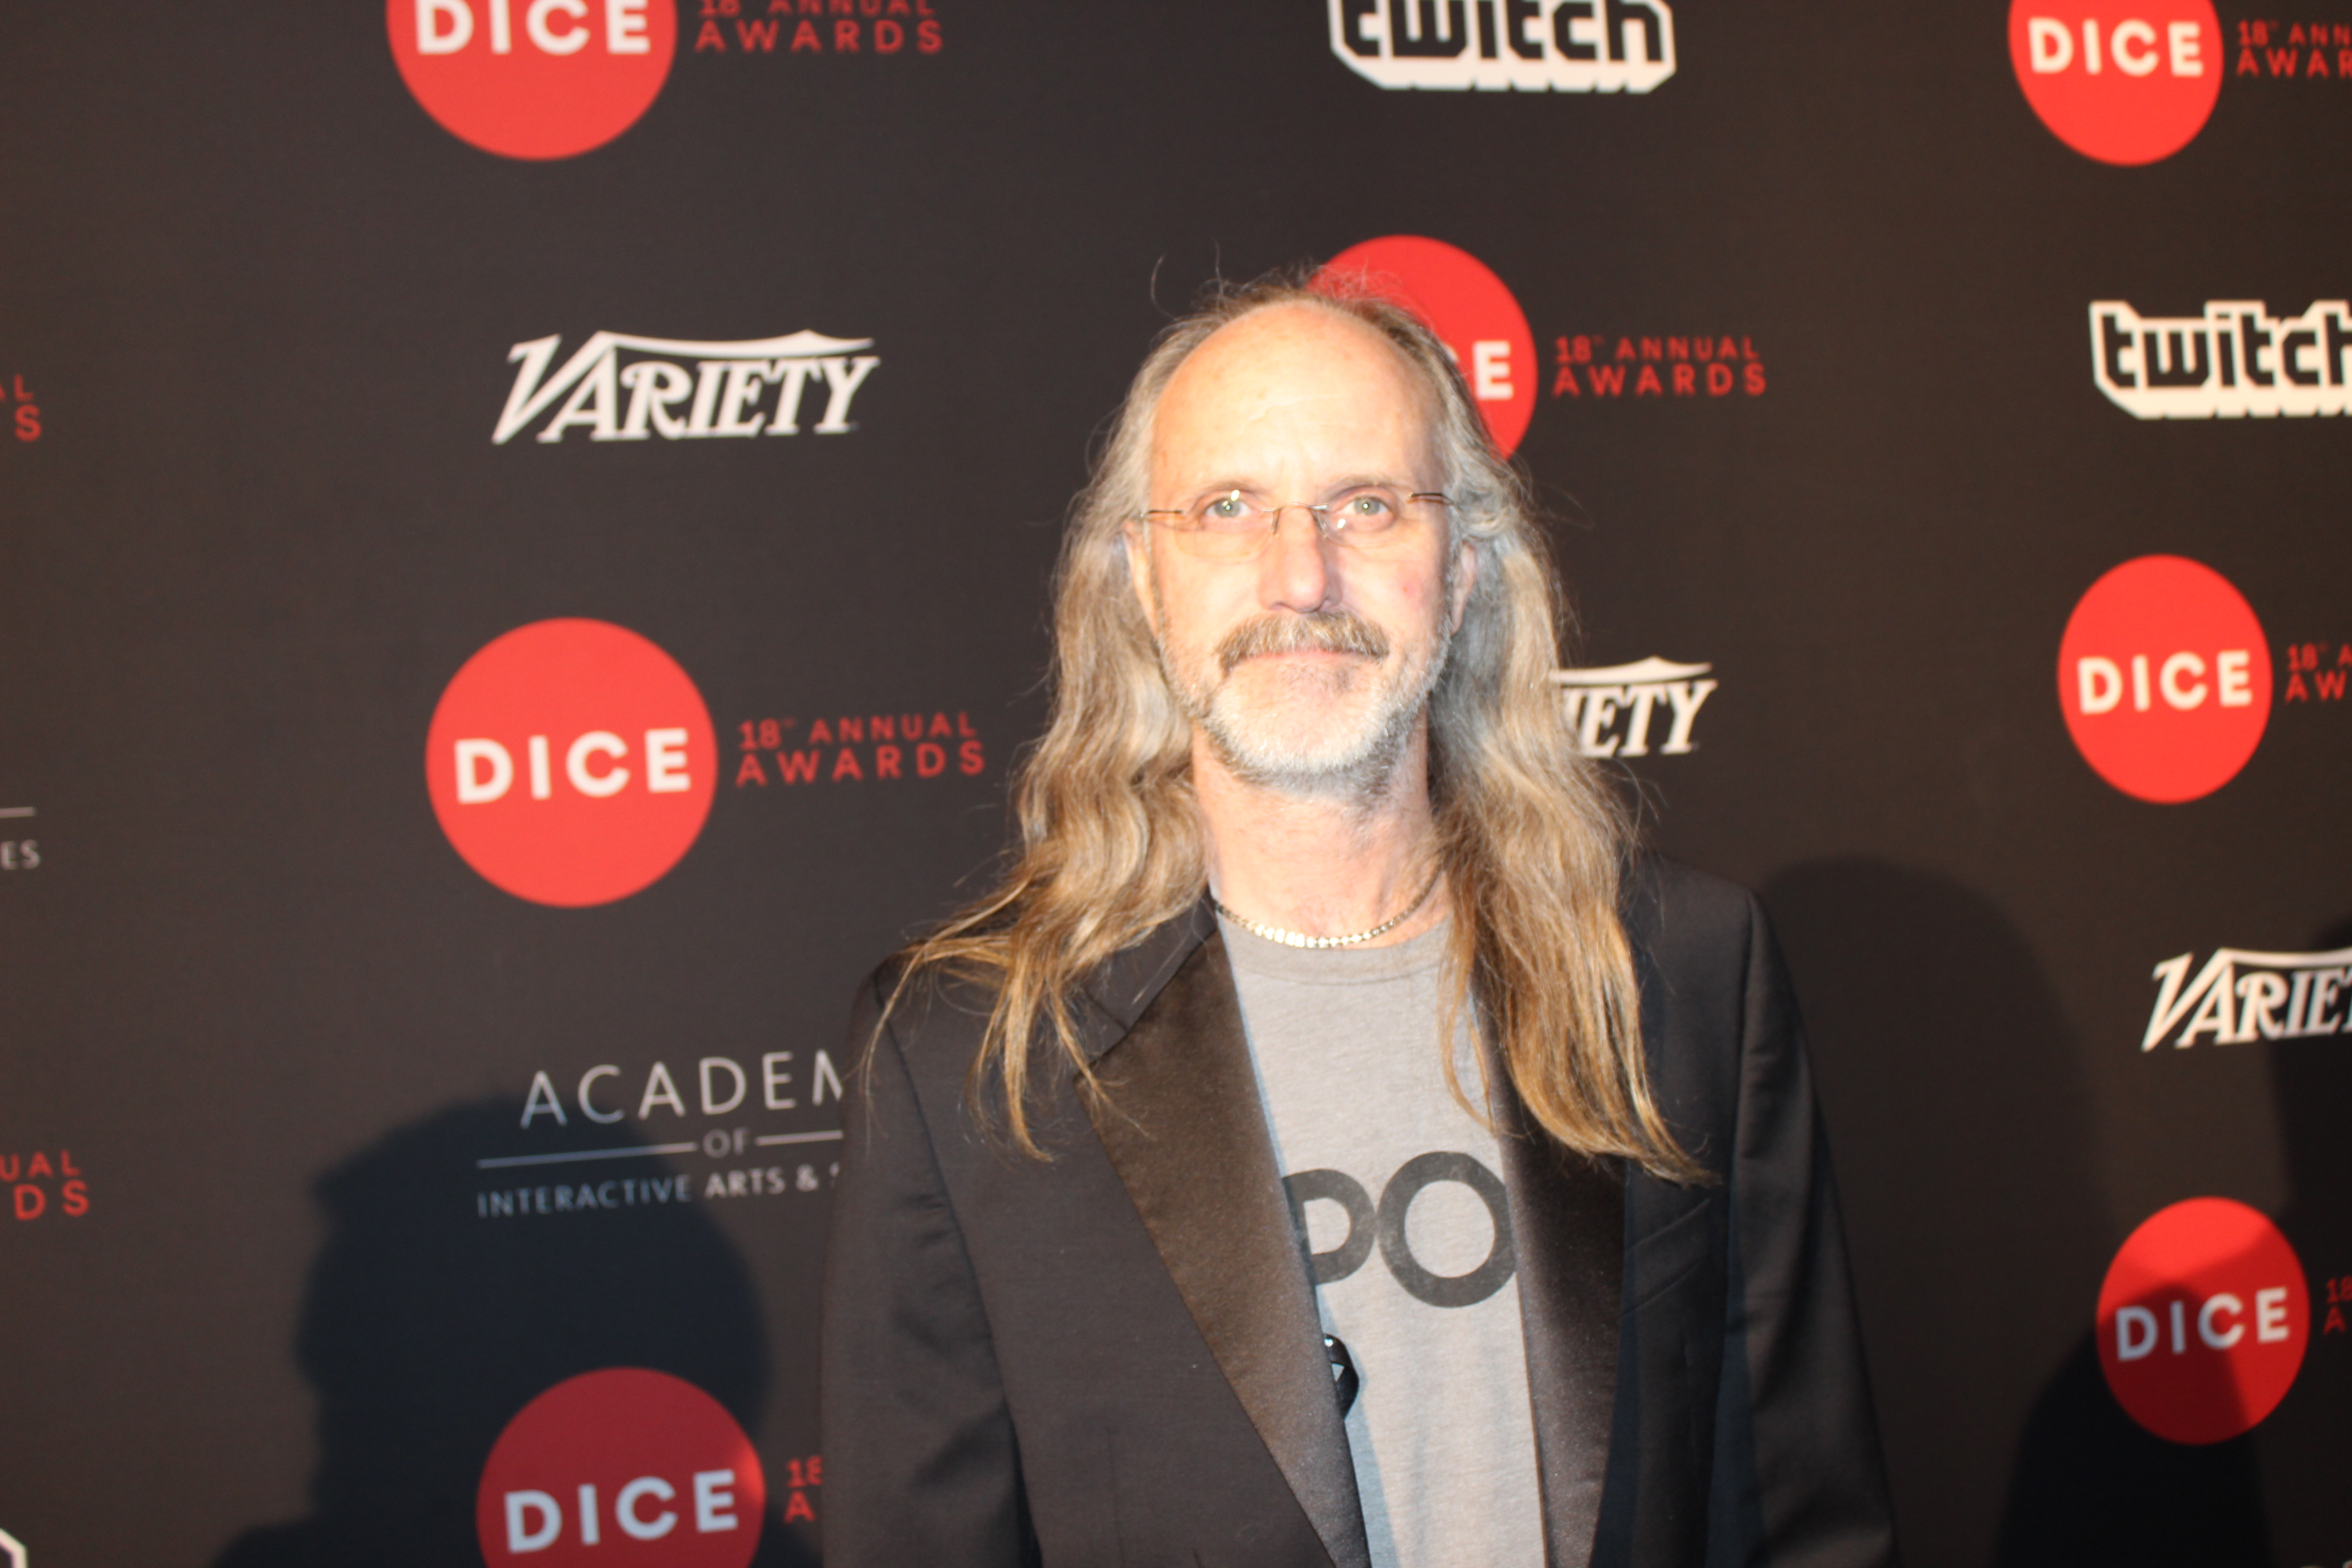 Amazon Game Studios' Rich Hilleman